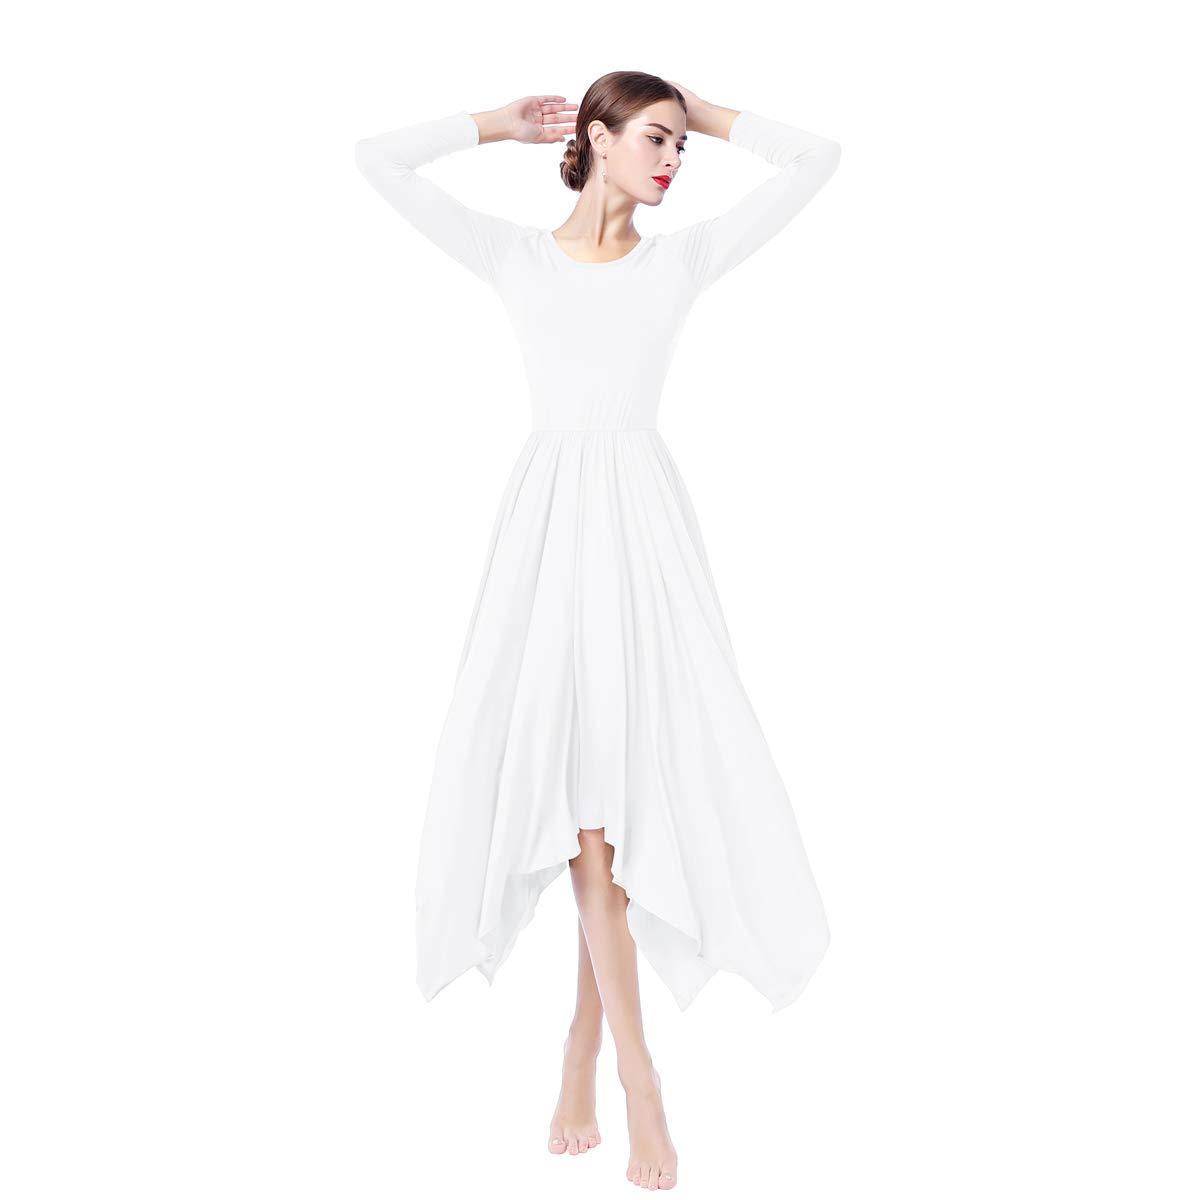 IBTOM CASTLE DRESS IBTOM レディース B07DNWDV1V B07DNWDV1V Large|ホワイト ホワイト ホワイト Large, 芽室町:9c63c51f --- ijpba.info